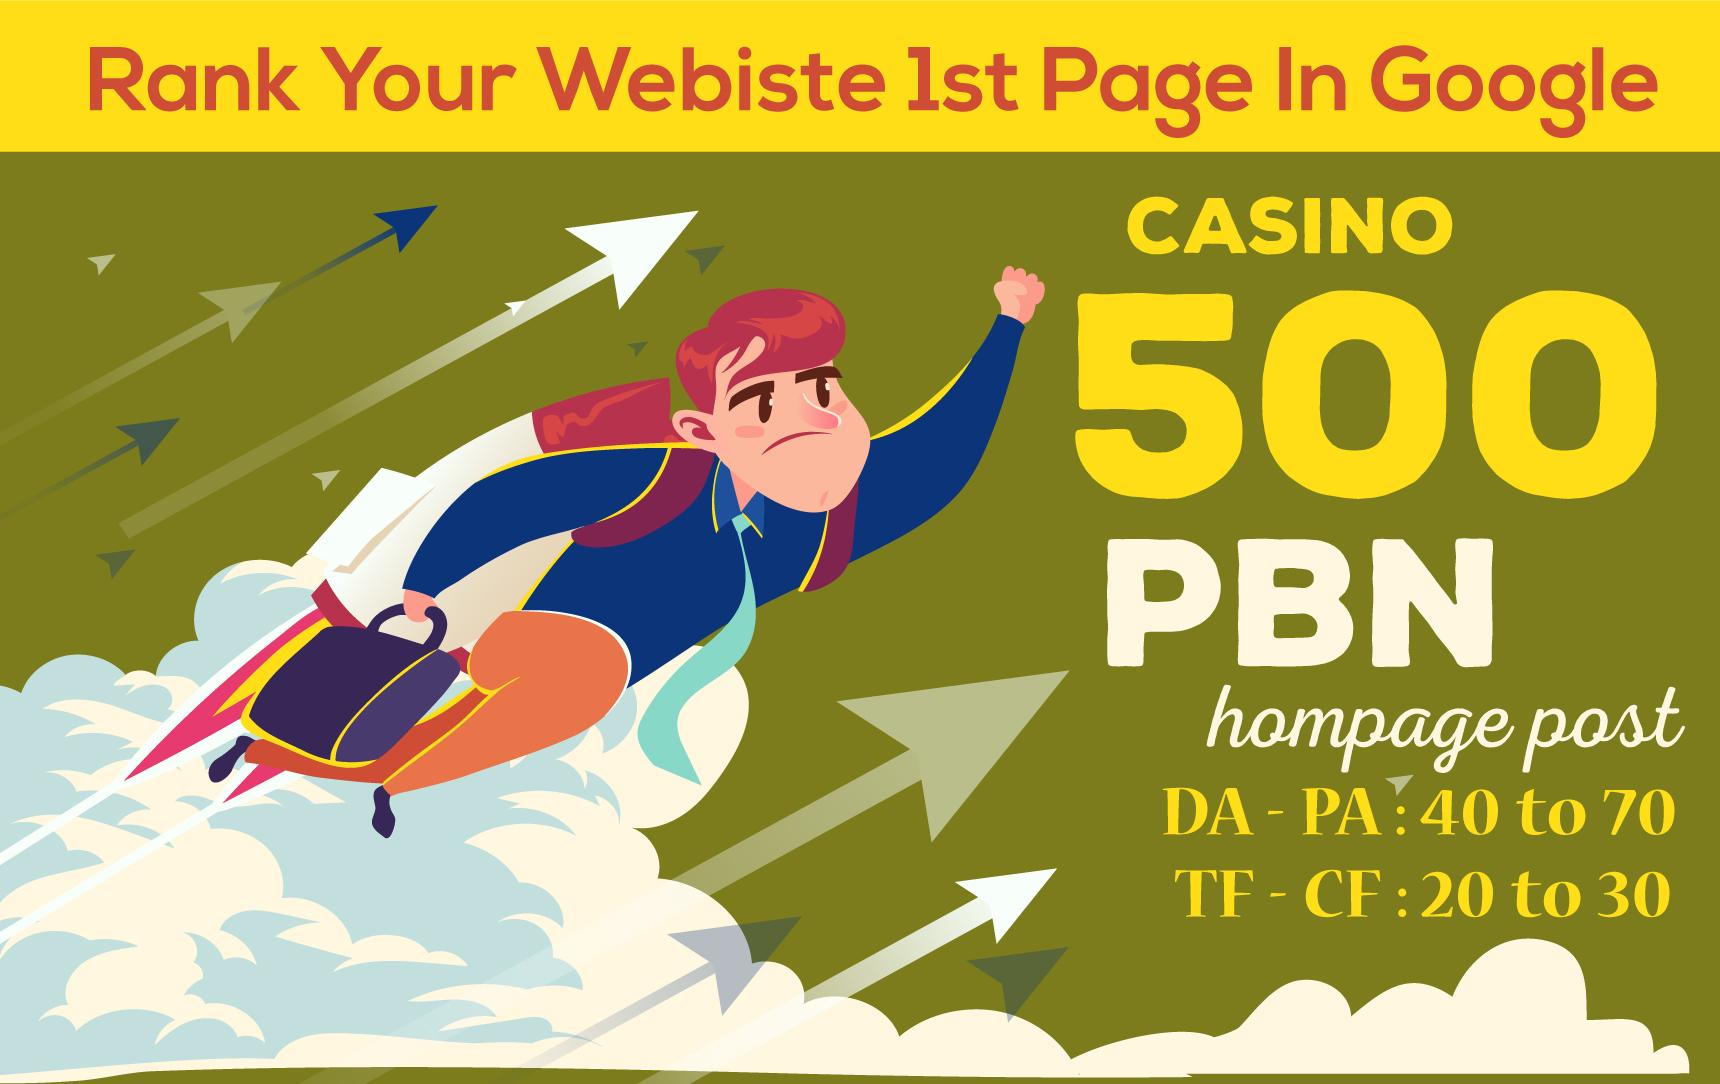 Do 500 DA50+ Casino Poker Betting Gambling PBN Backlinks Online Casino Blogs